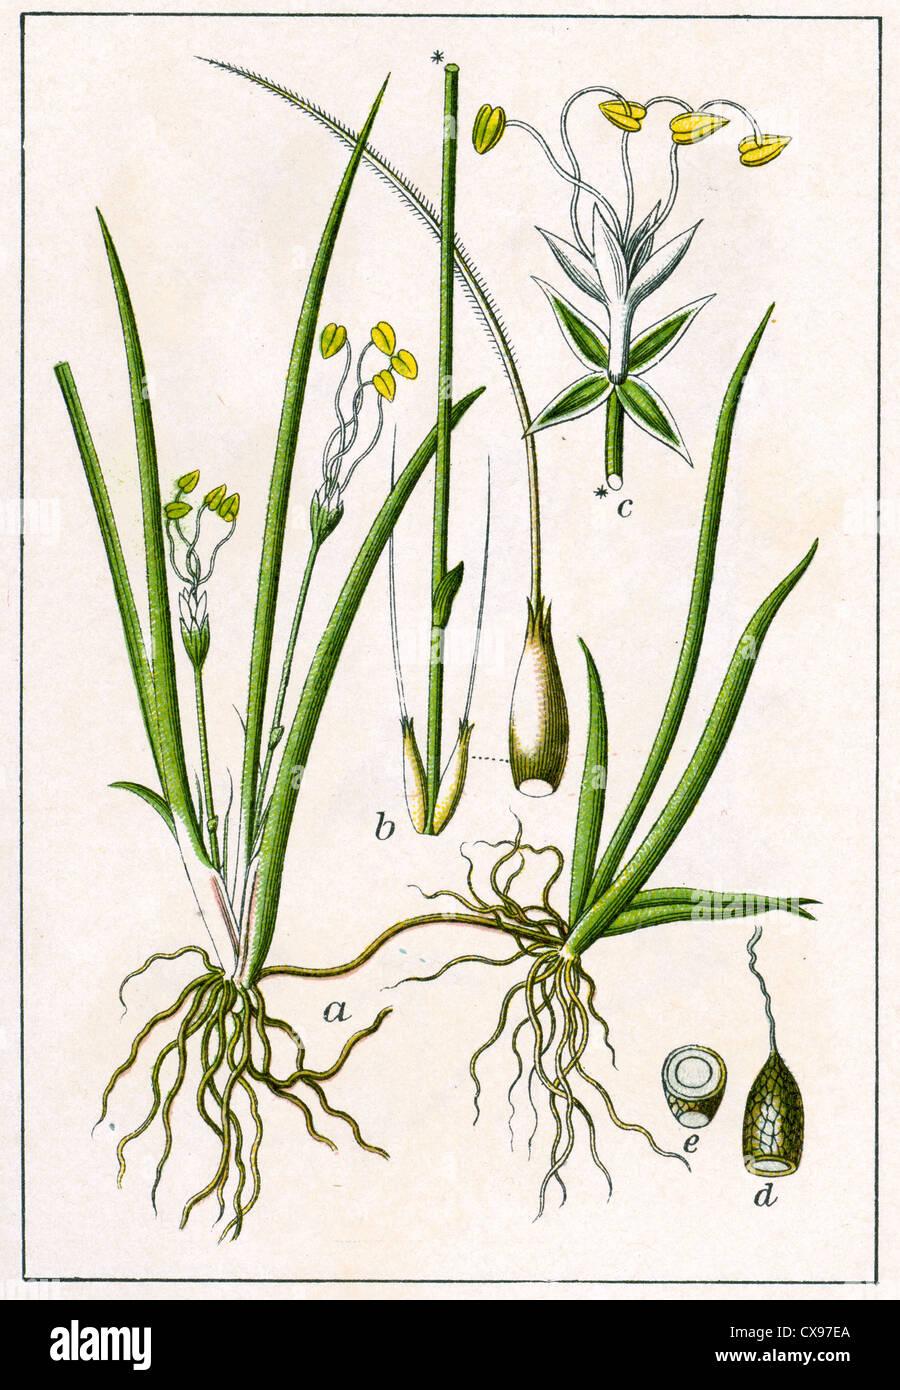 Litorella lacustris - Stock Image